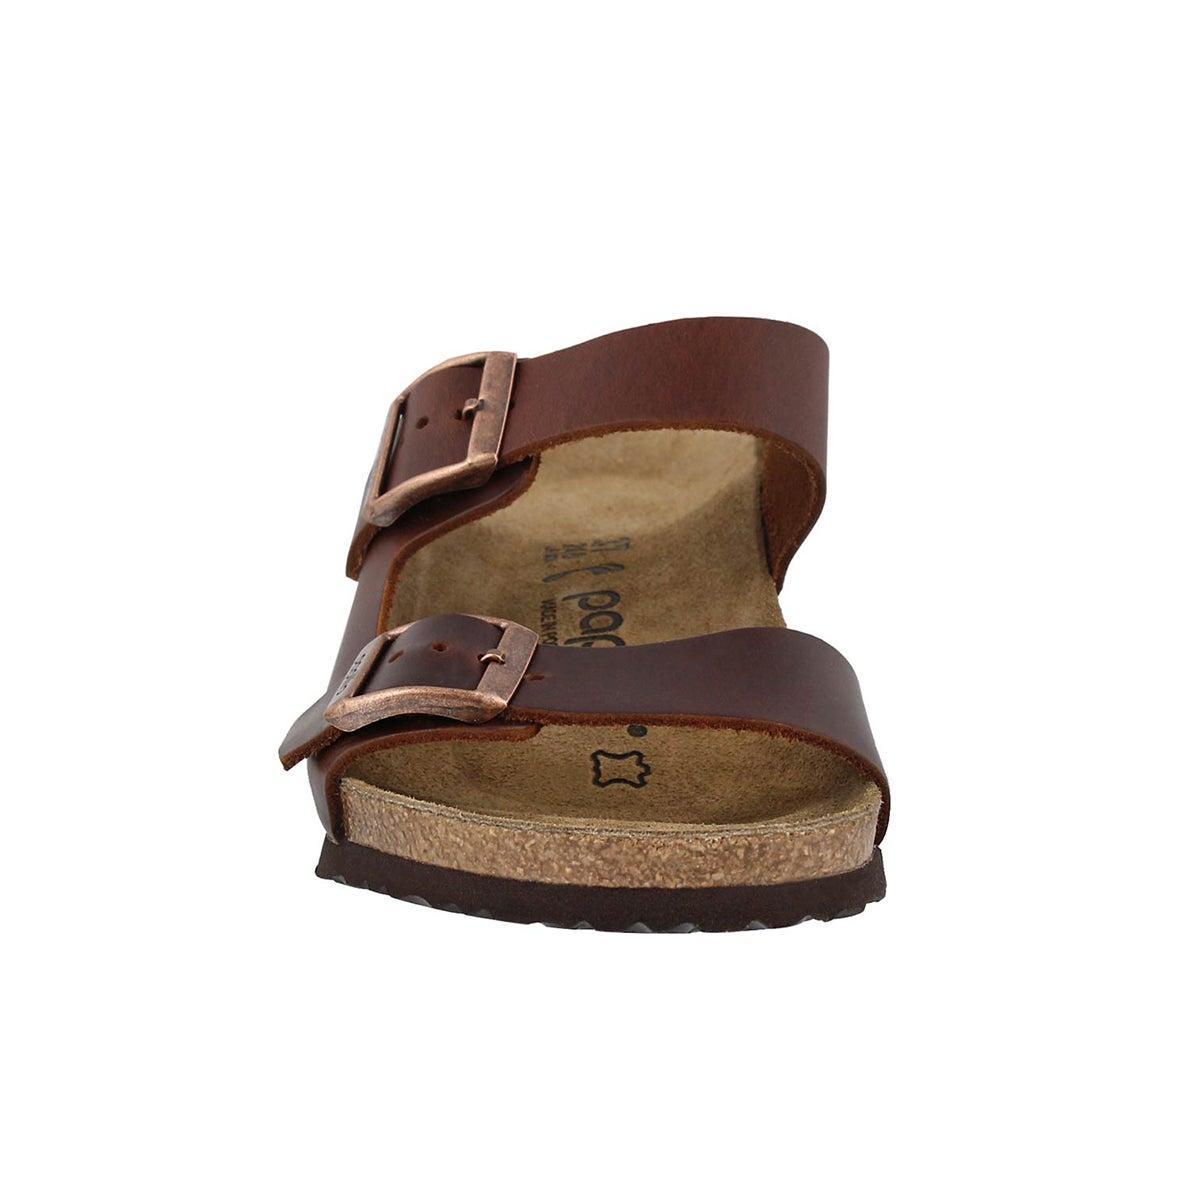 Lds Emina LTR cognac wedge sandal-N